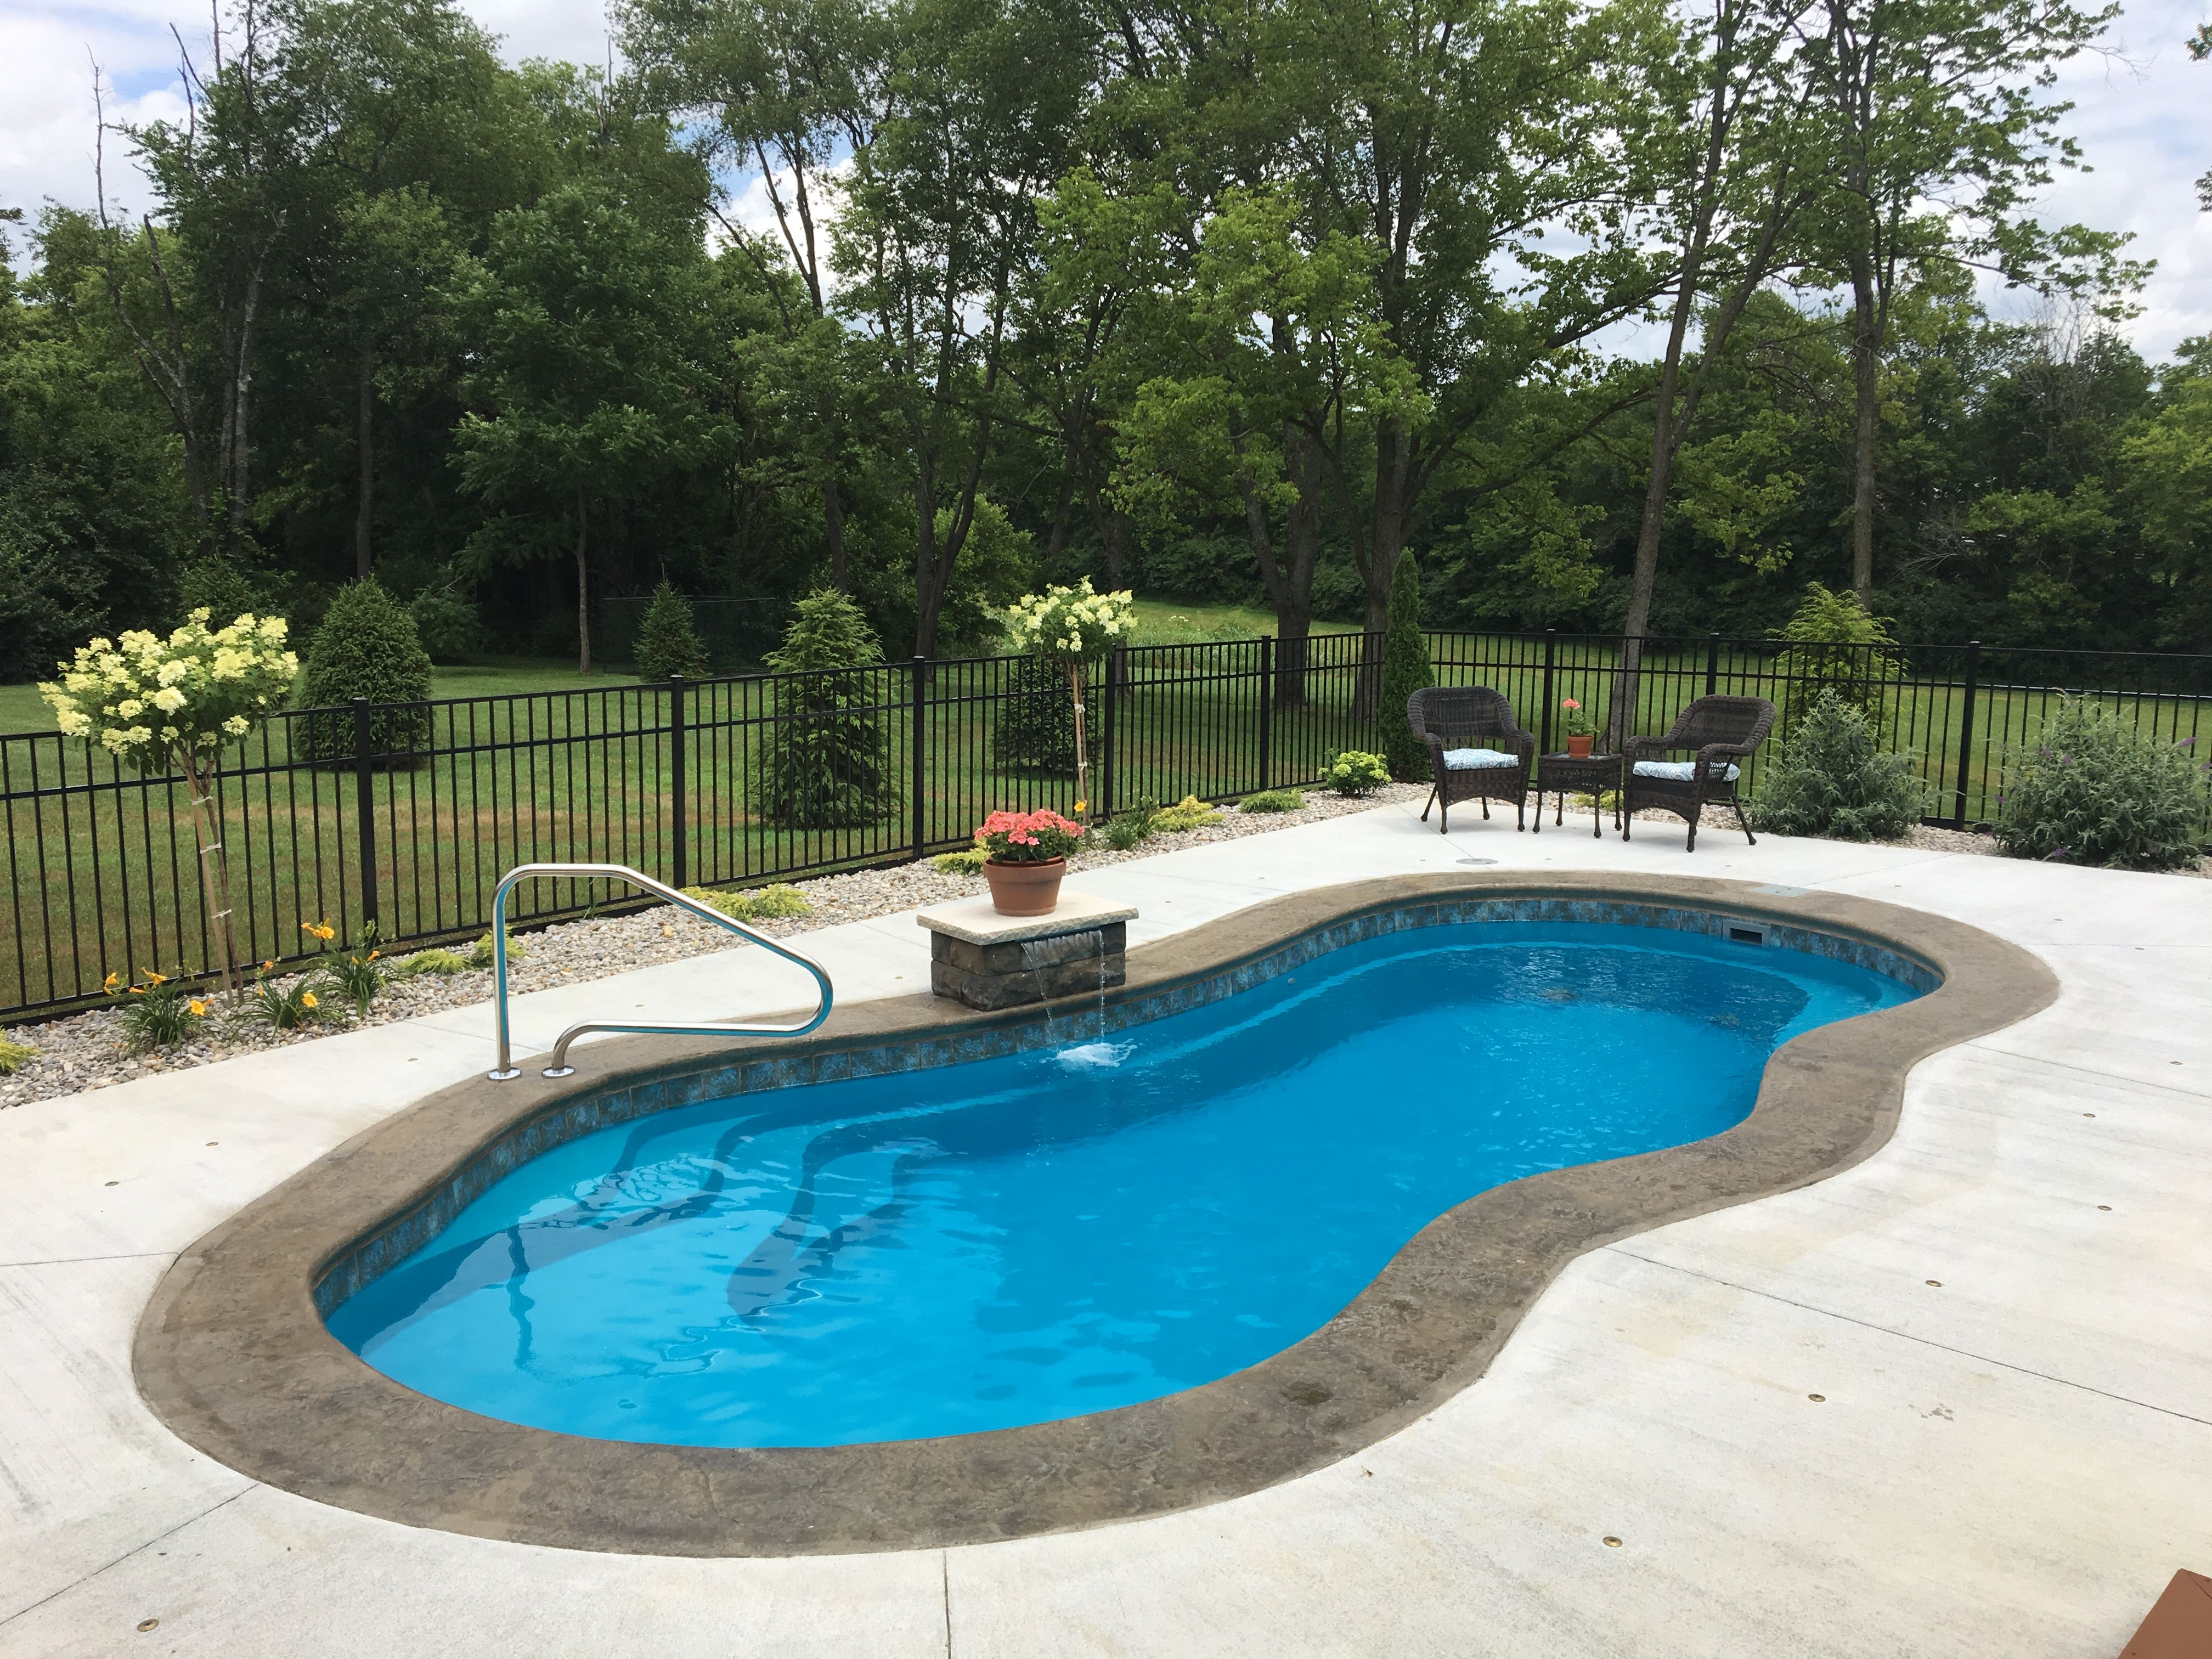 Imagine Pools The Fantasy Fiberglass Swimming Pools Pool Backyard Pool